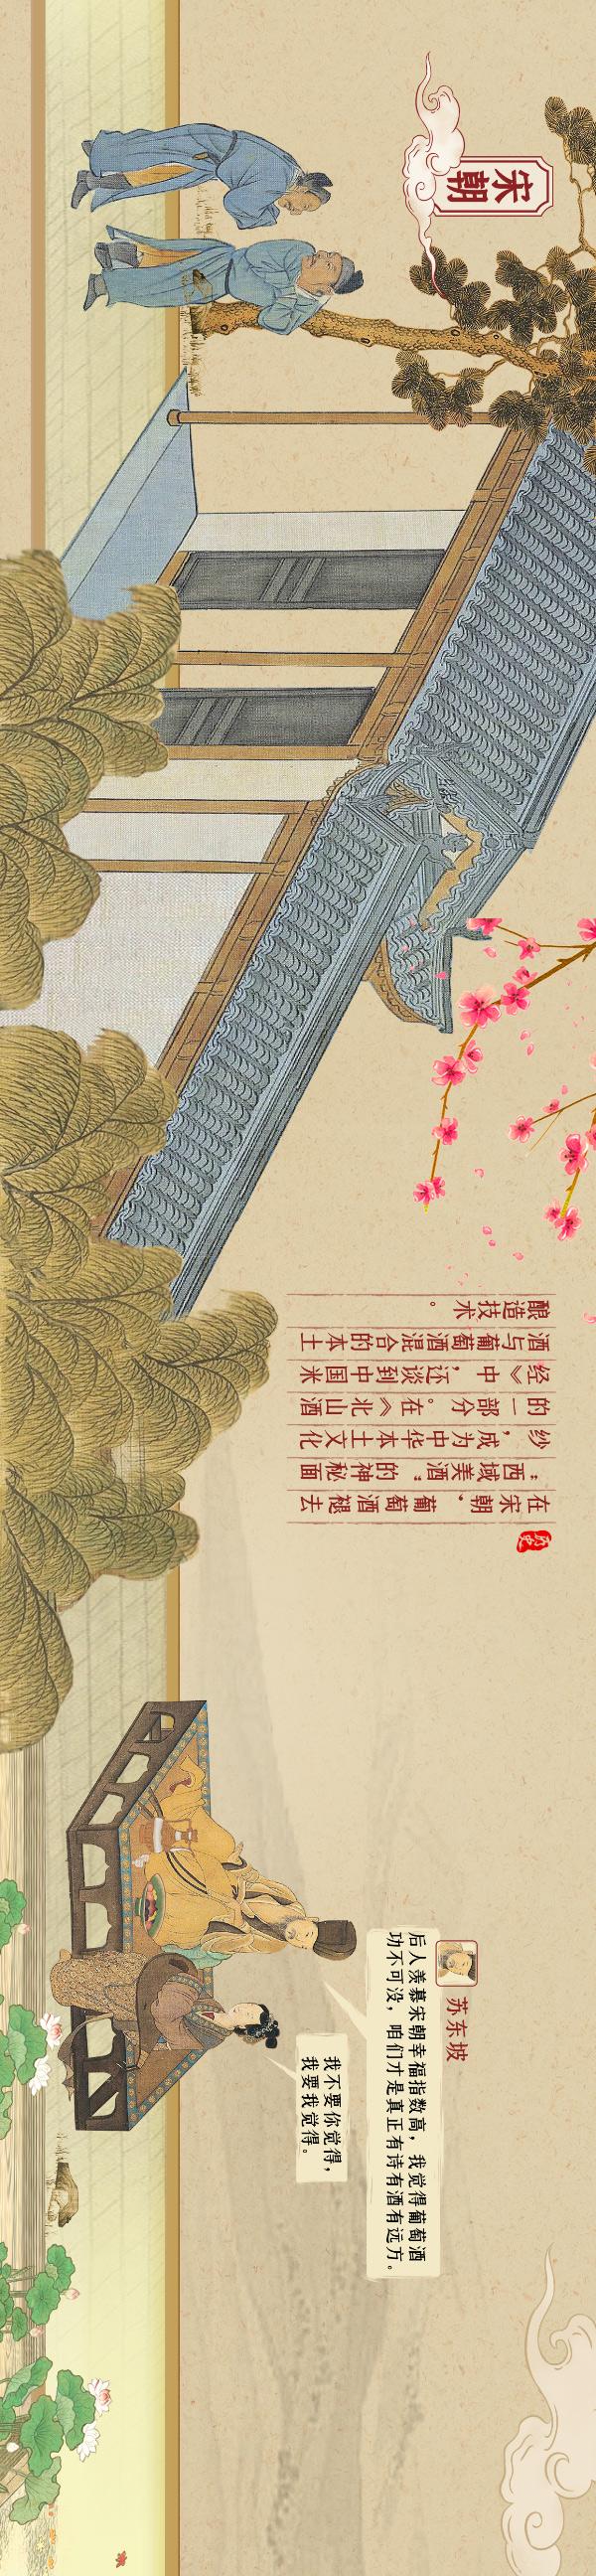 6葡萄�v史副本_副本_09